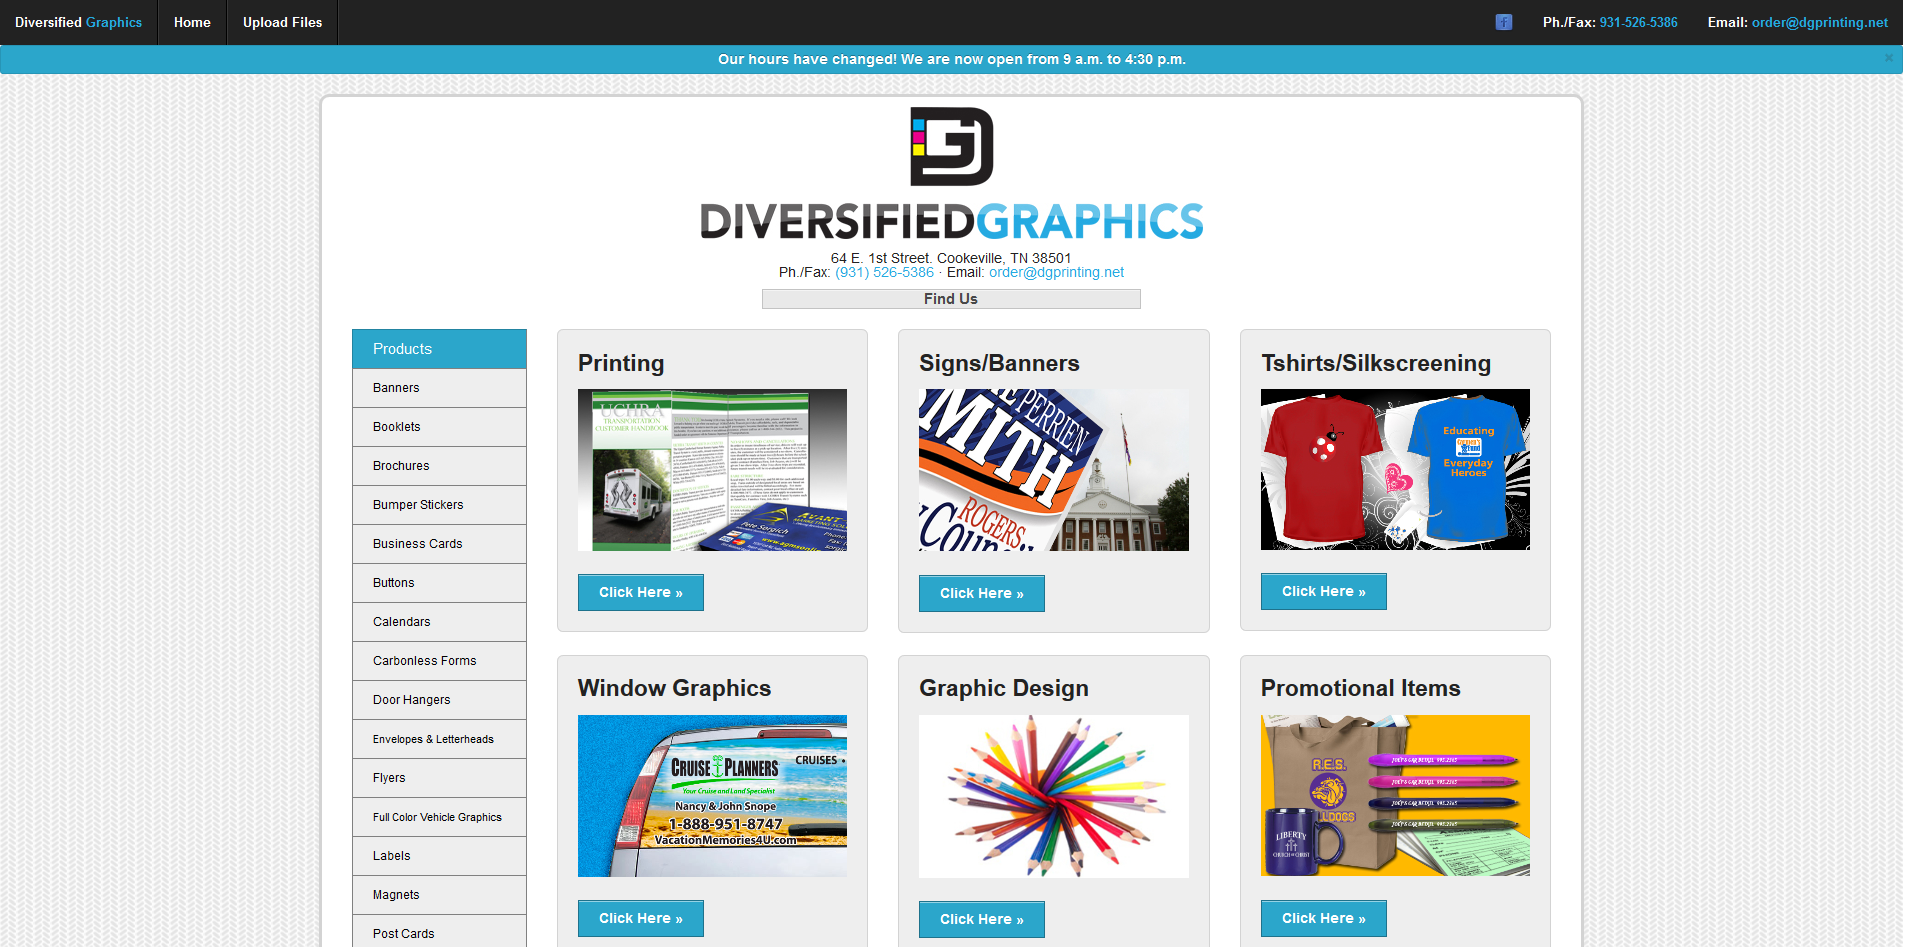 Diversified Graphics